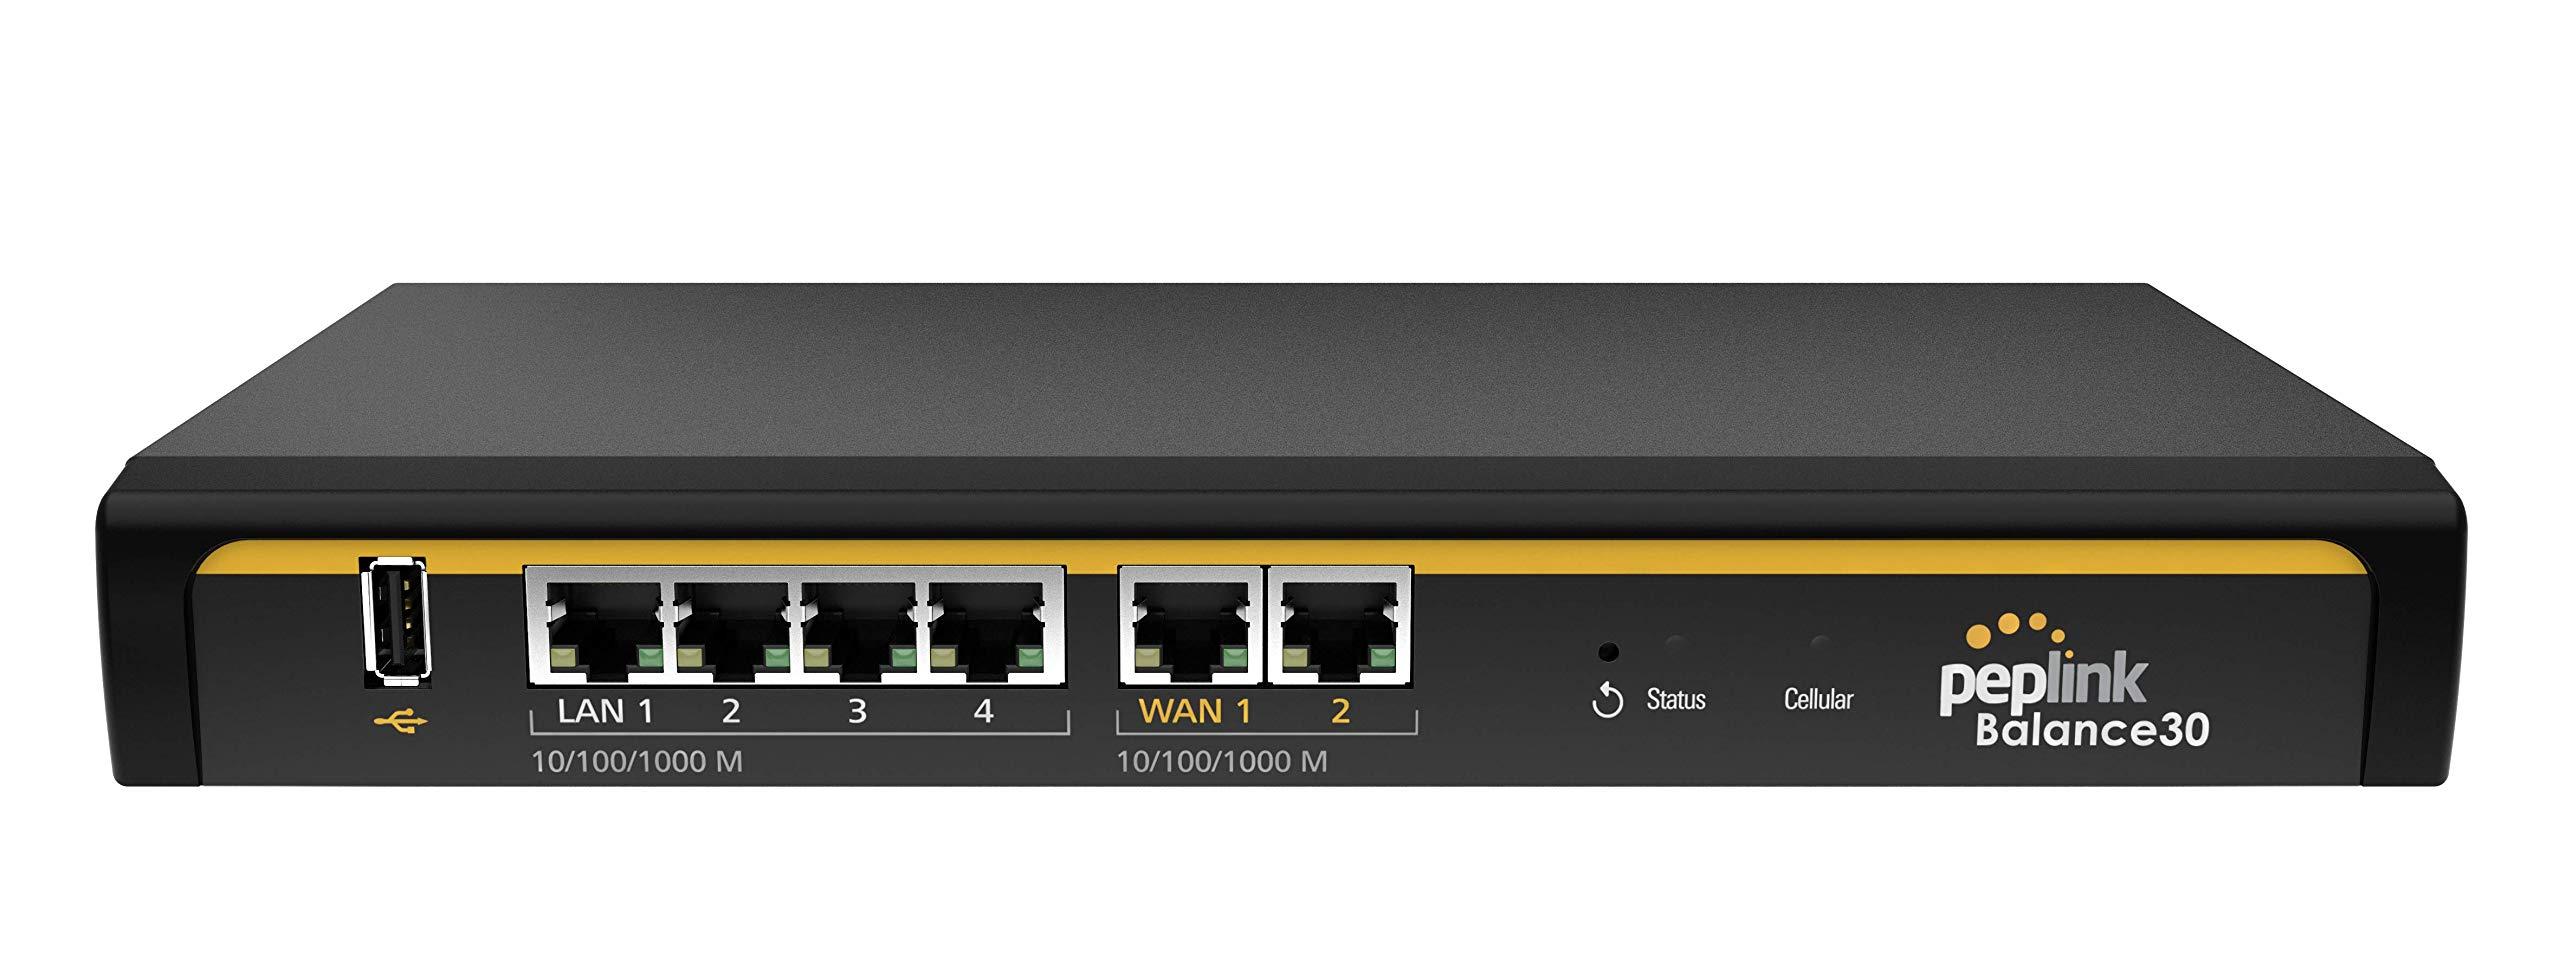 Peplink Balance 30 LTE Multi-WAN 4G LTE Router (BPL-031-LTE-A-T)